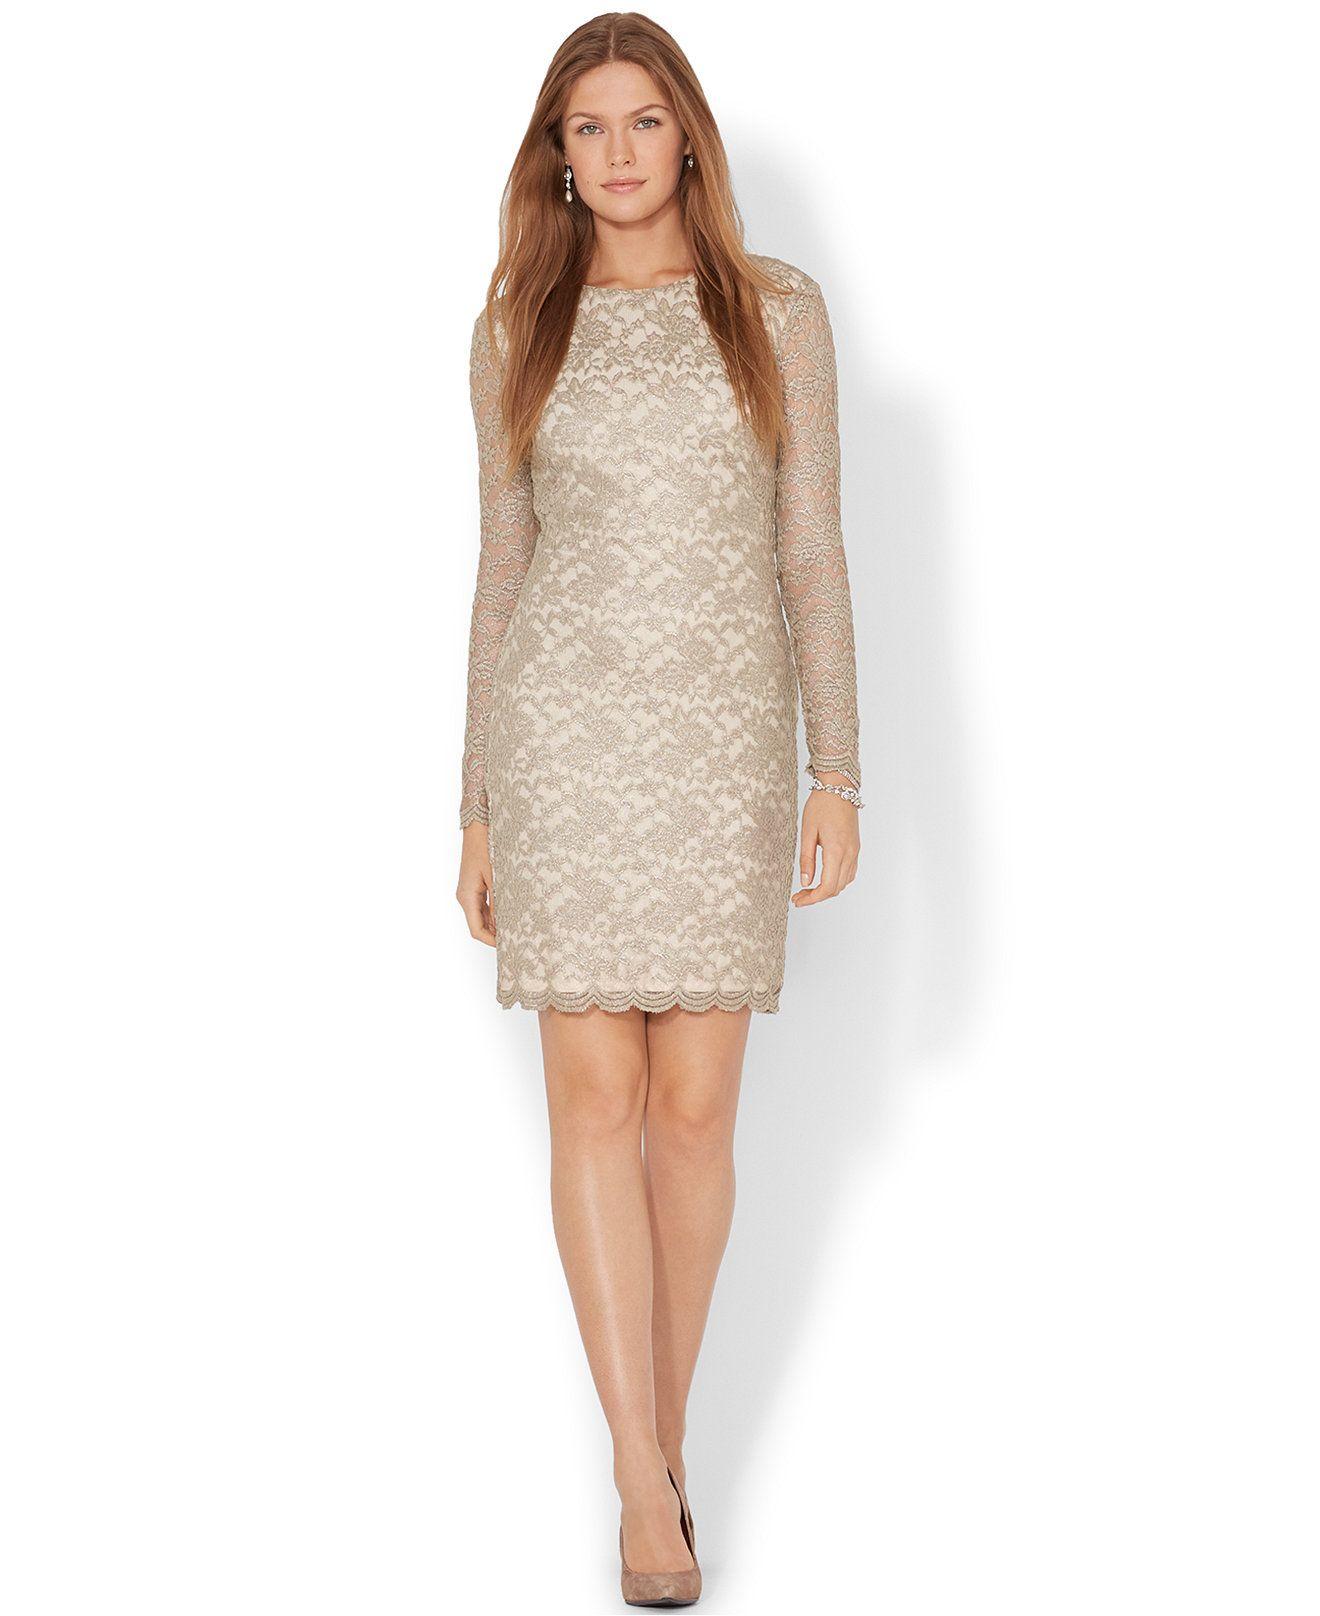 Macys Lace Dress Womens Carley Connellan